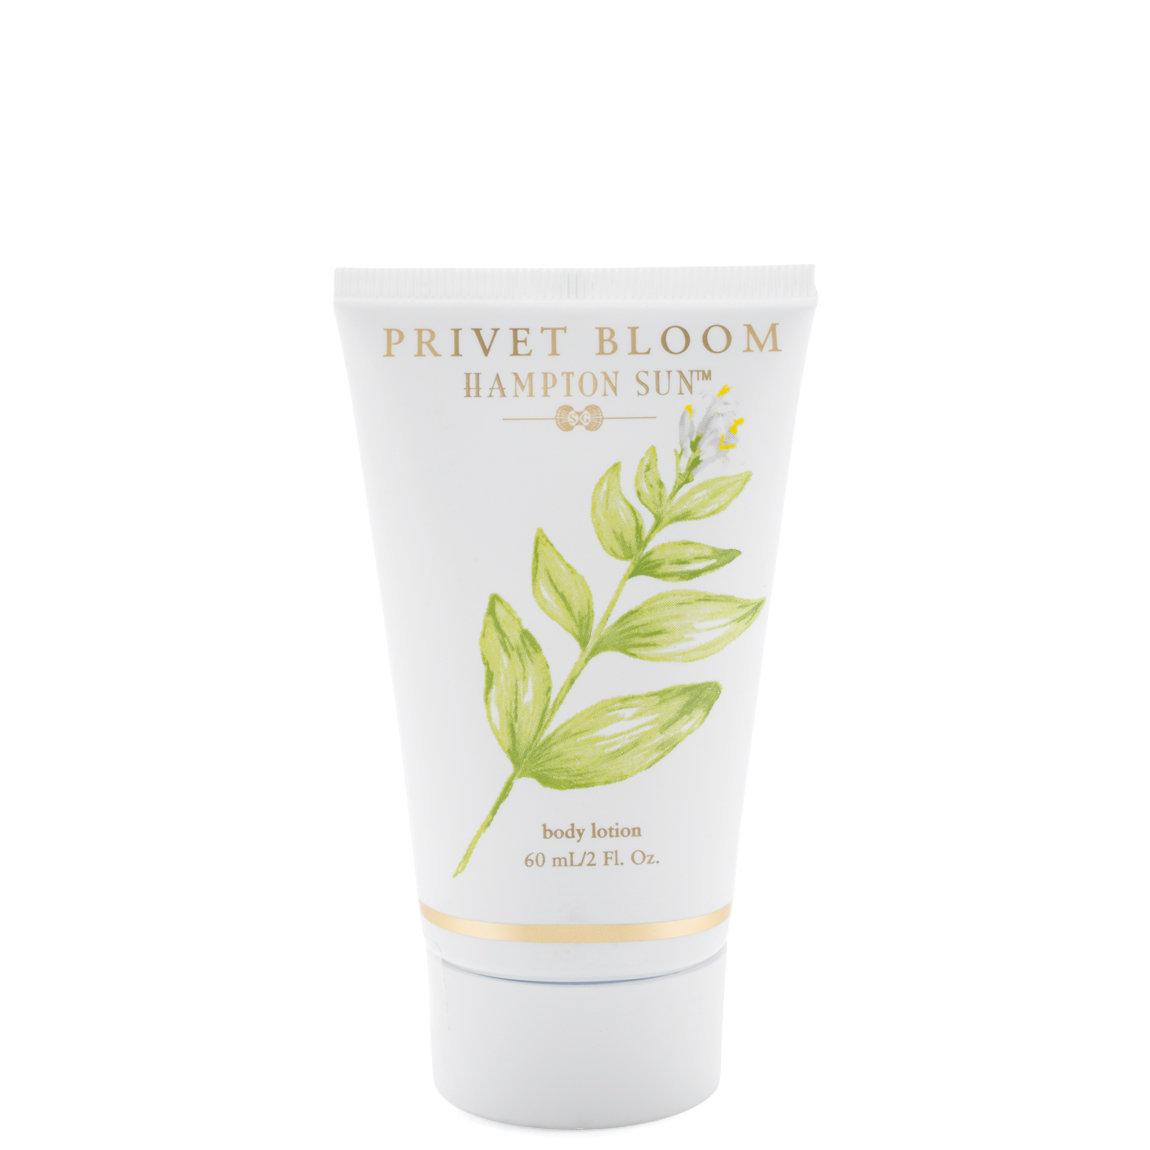 Hampton Sun Privet Bloom Body Lotion 2 oz product swatch.